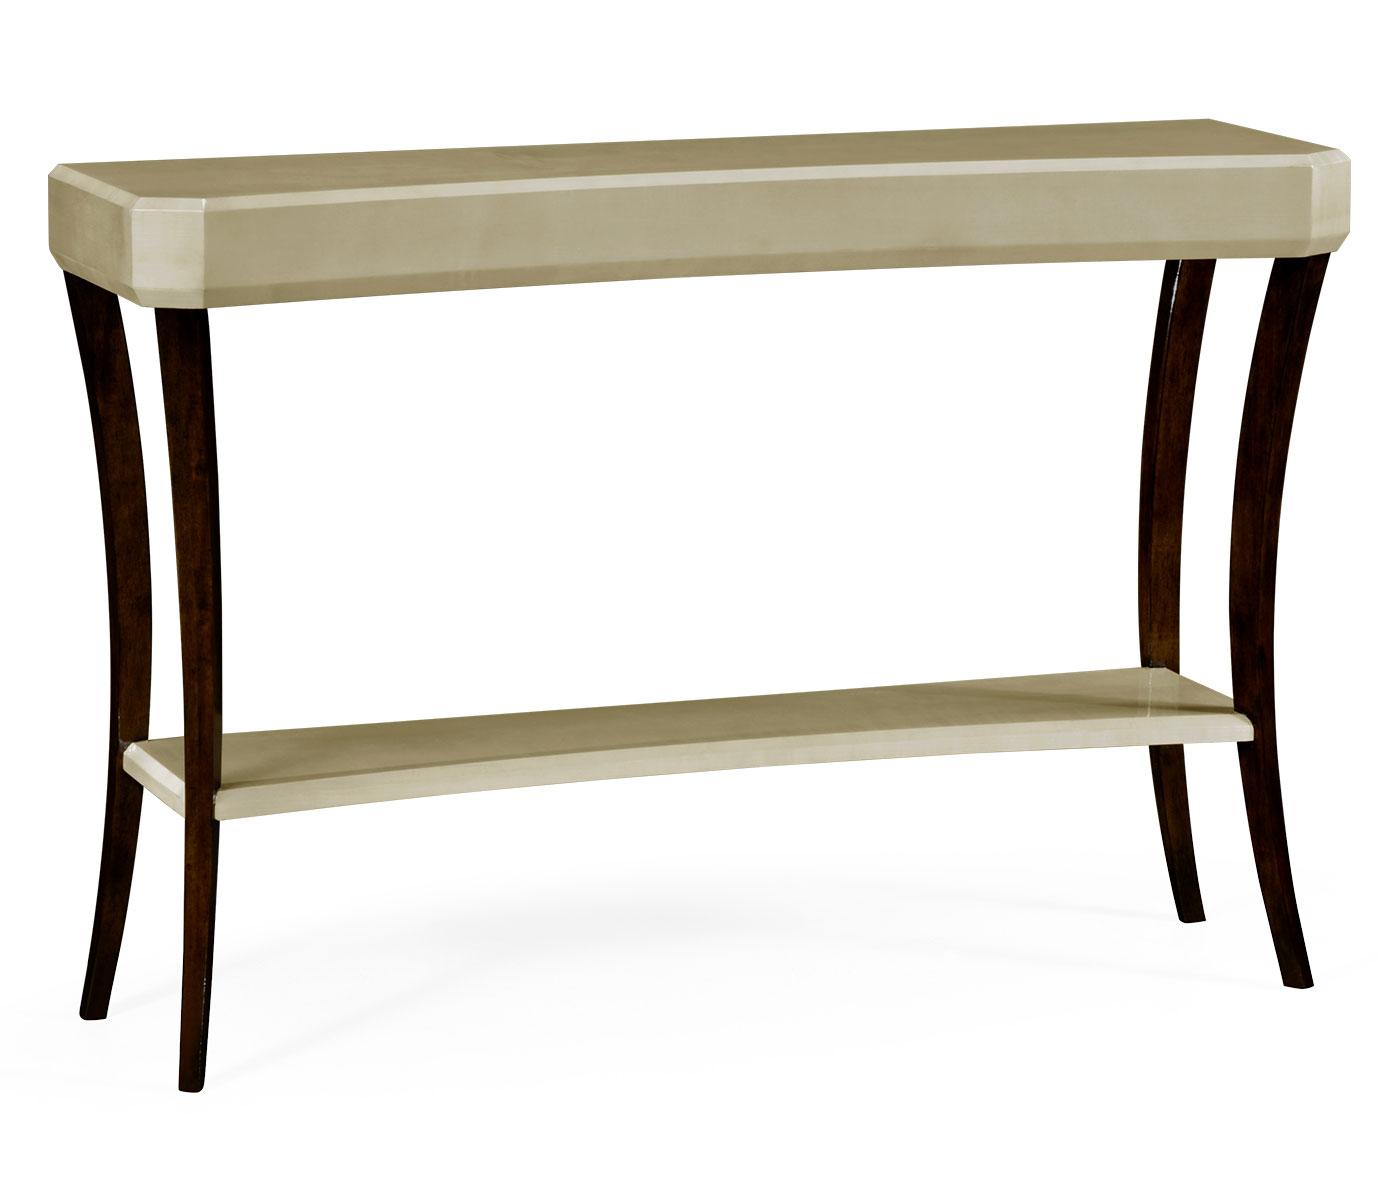 art deco console table. Black Bedroom Furniture Sets. Home Design Ideas